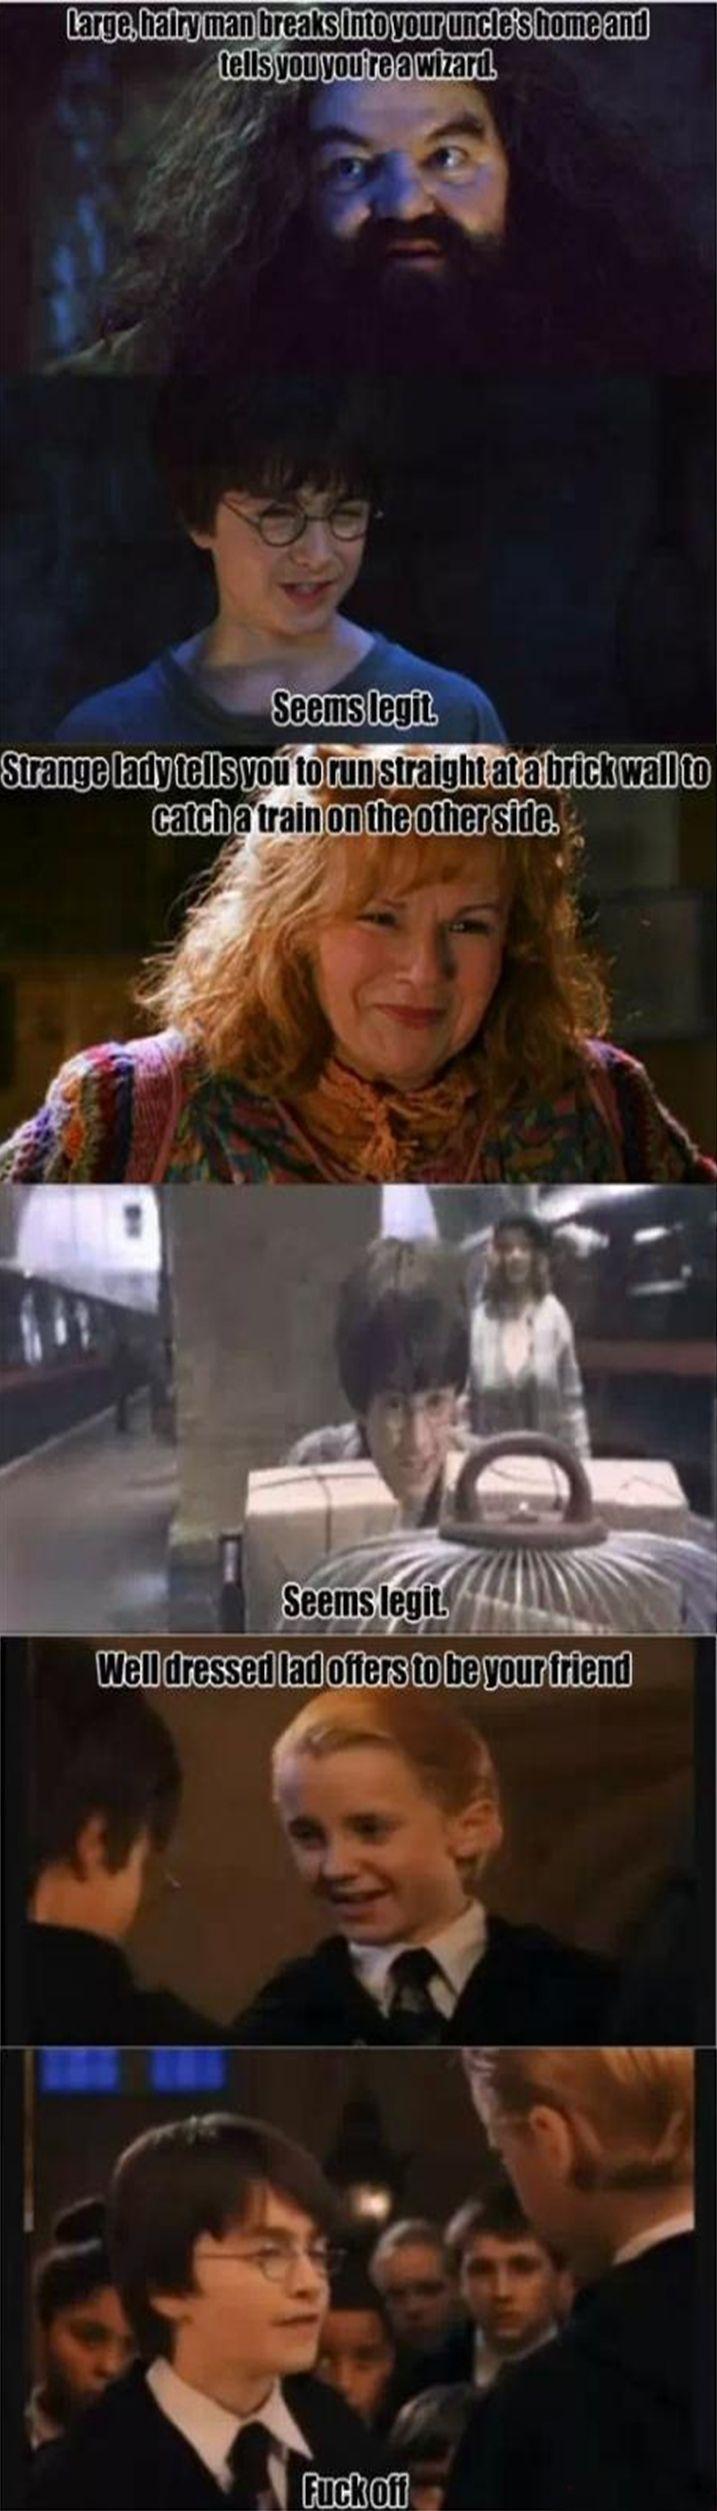 Potter Logic Lolsnaps Harry Potter Funny Harry Potter Memes Hilarious Harry Potter Puns